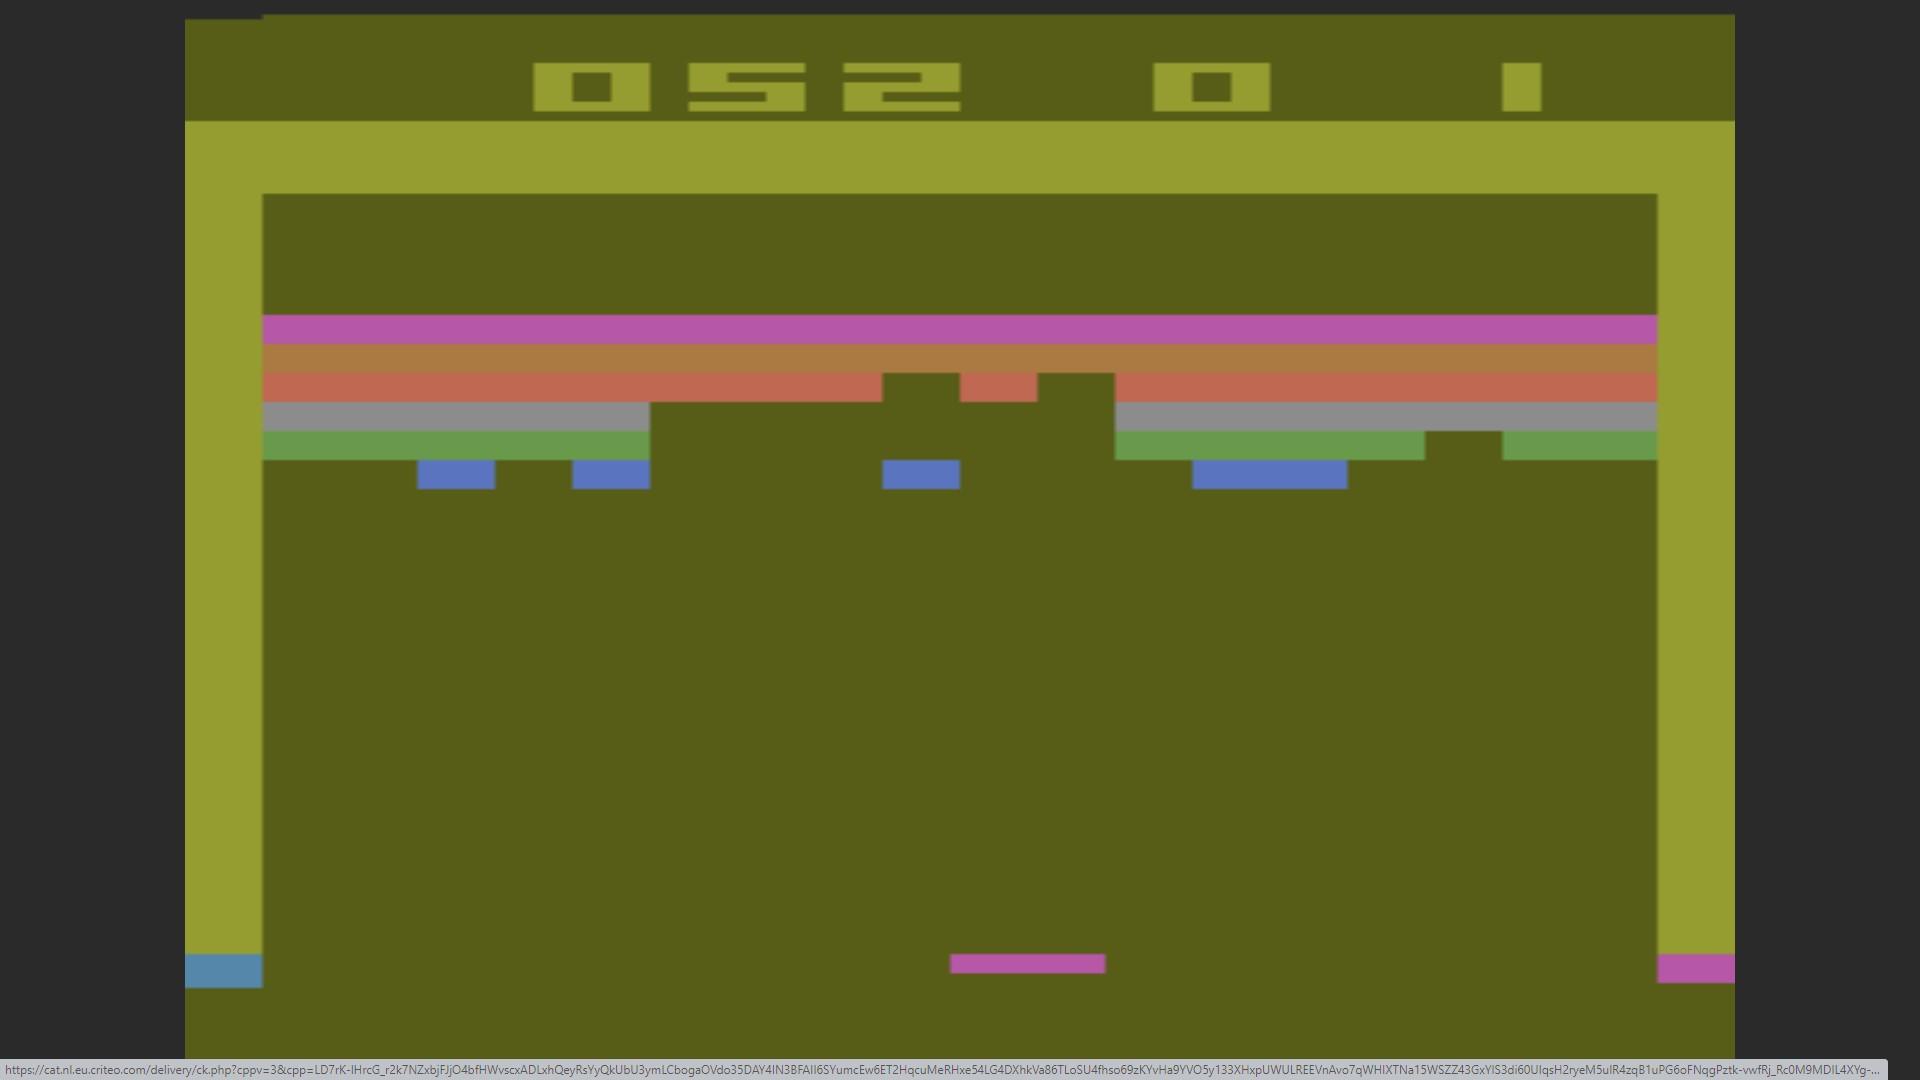 AkinNahtanoj: Breakout: Game 3 (Atari 2600 Emulated Novice/B Mode) 52 points on 2020-10-13 15:58:50